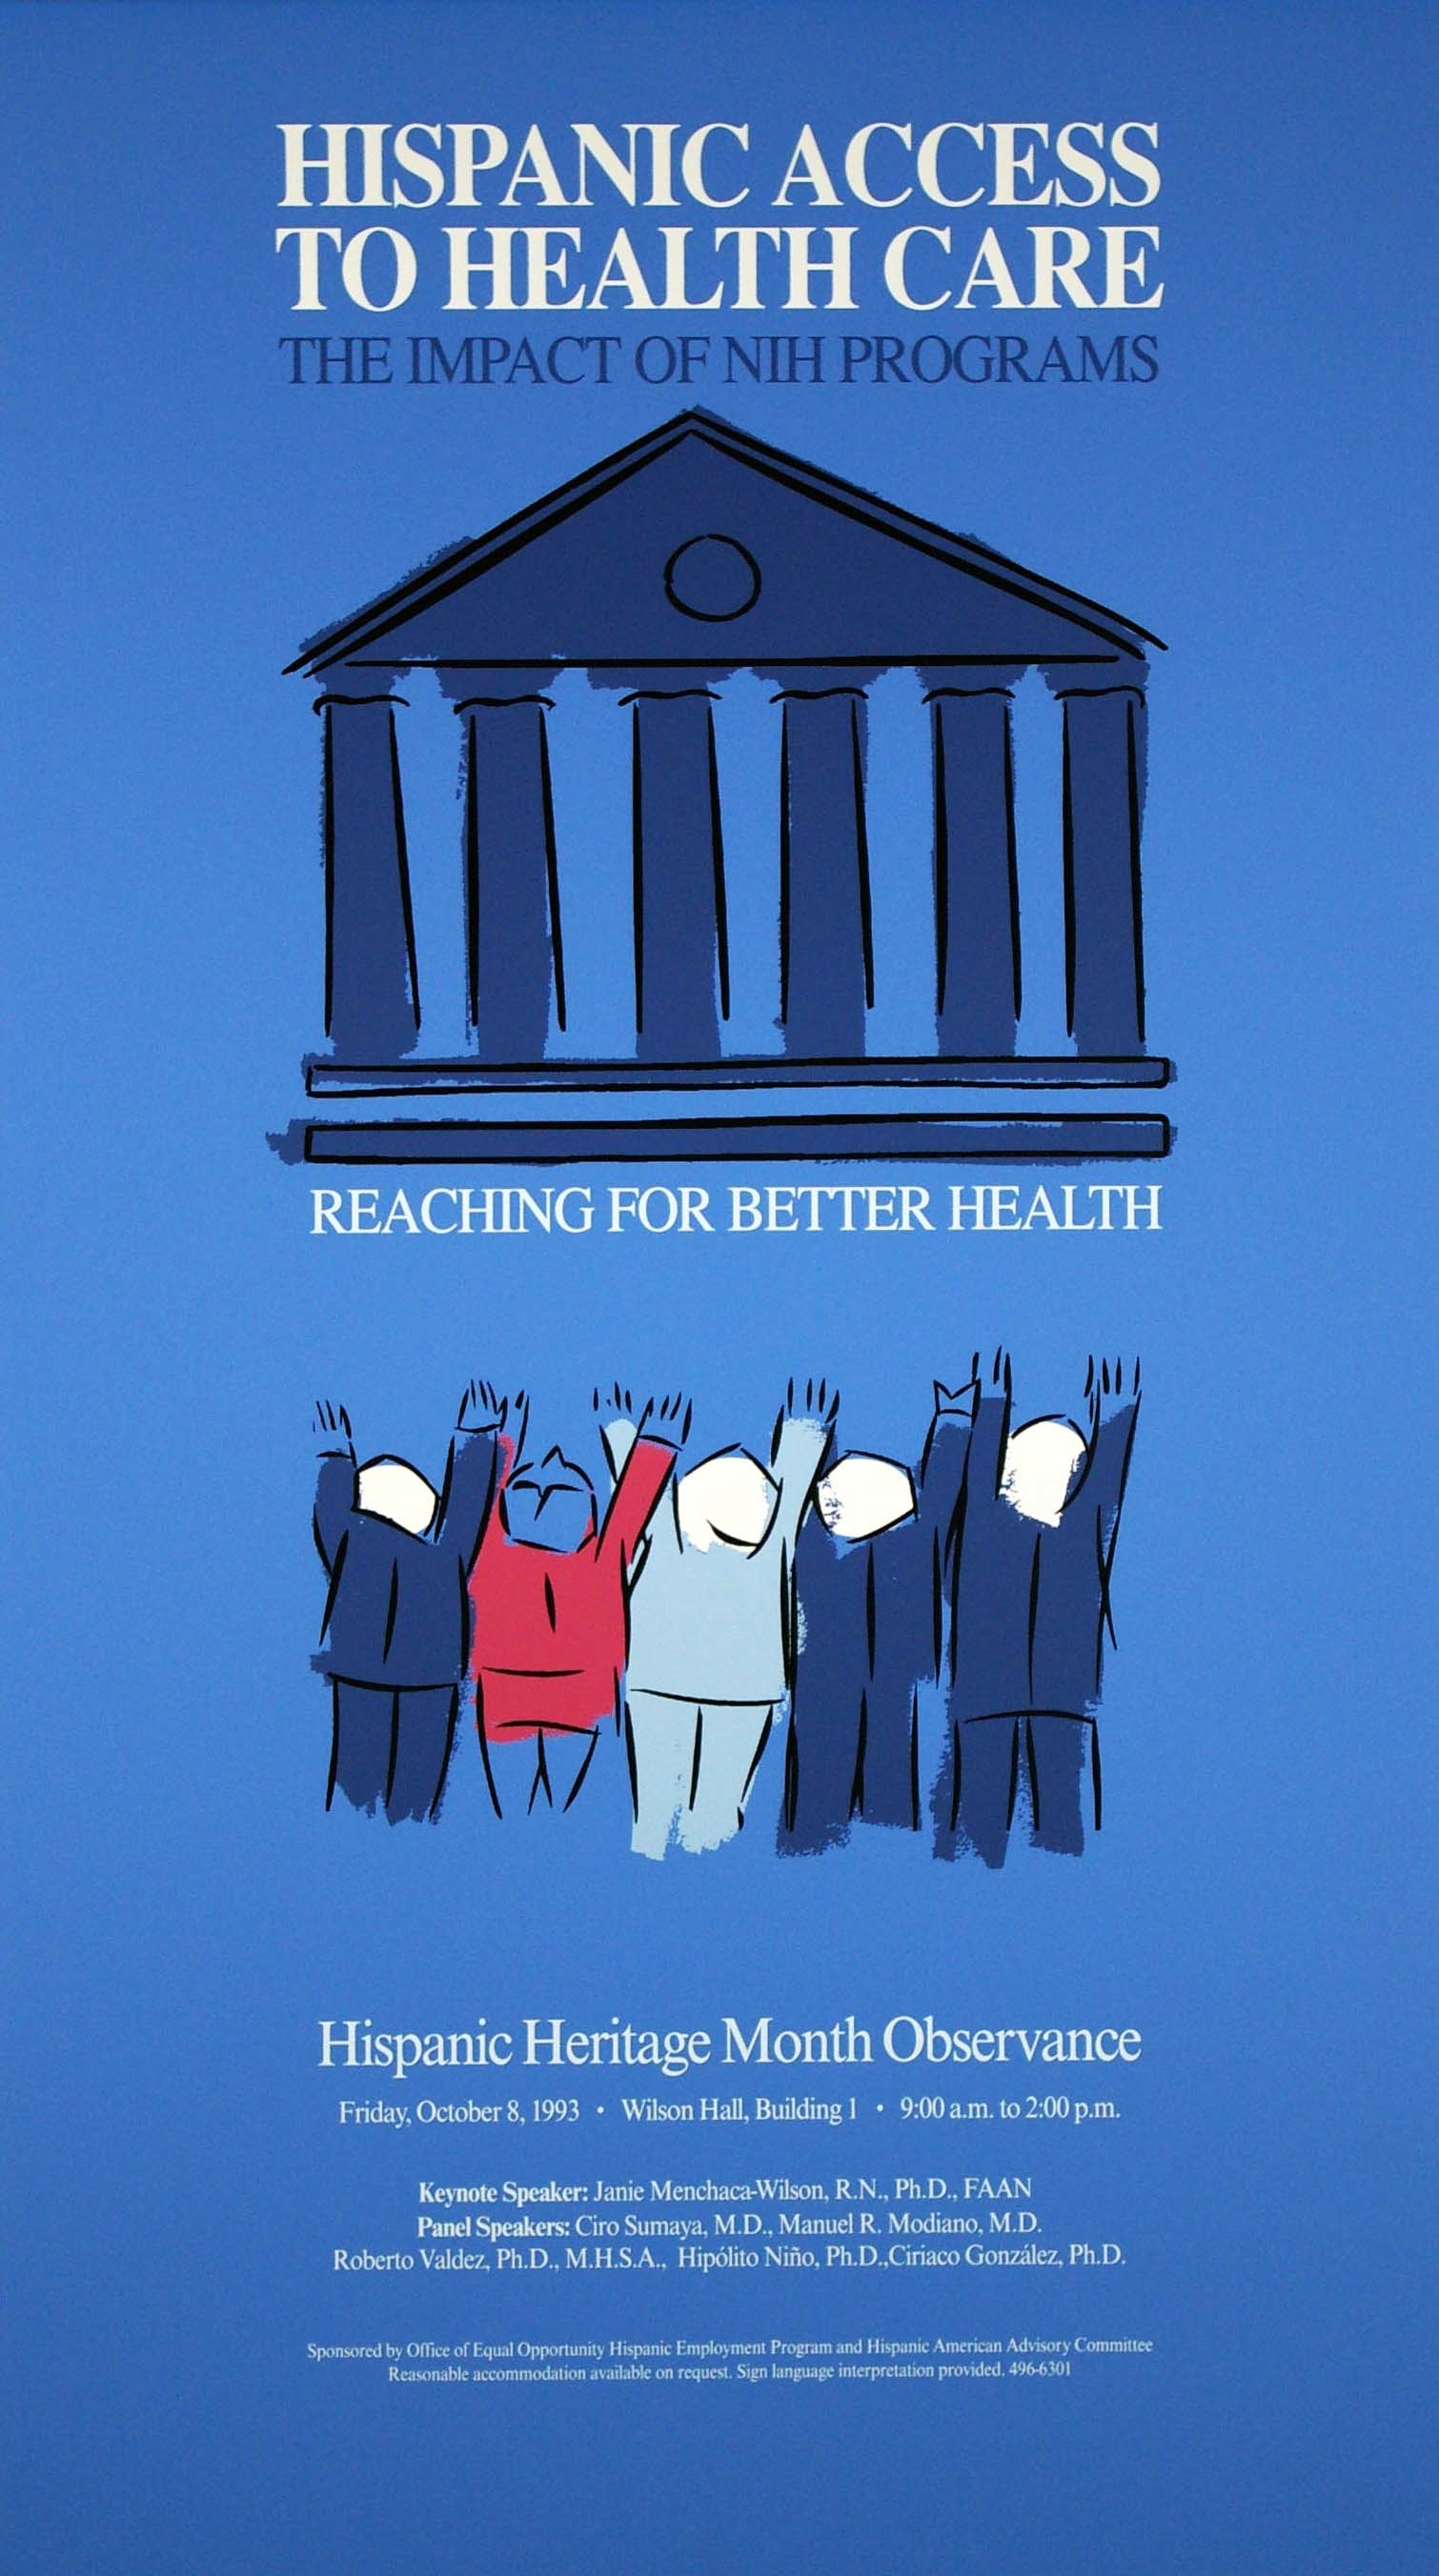 Hispanic Access to Healthcare